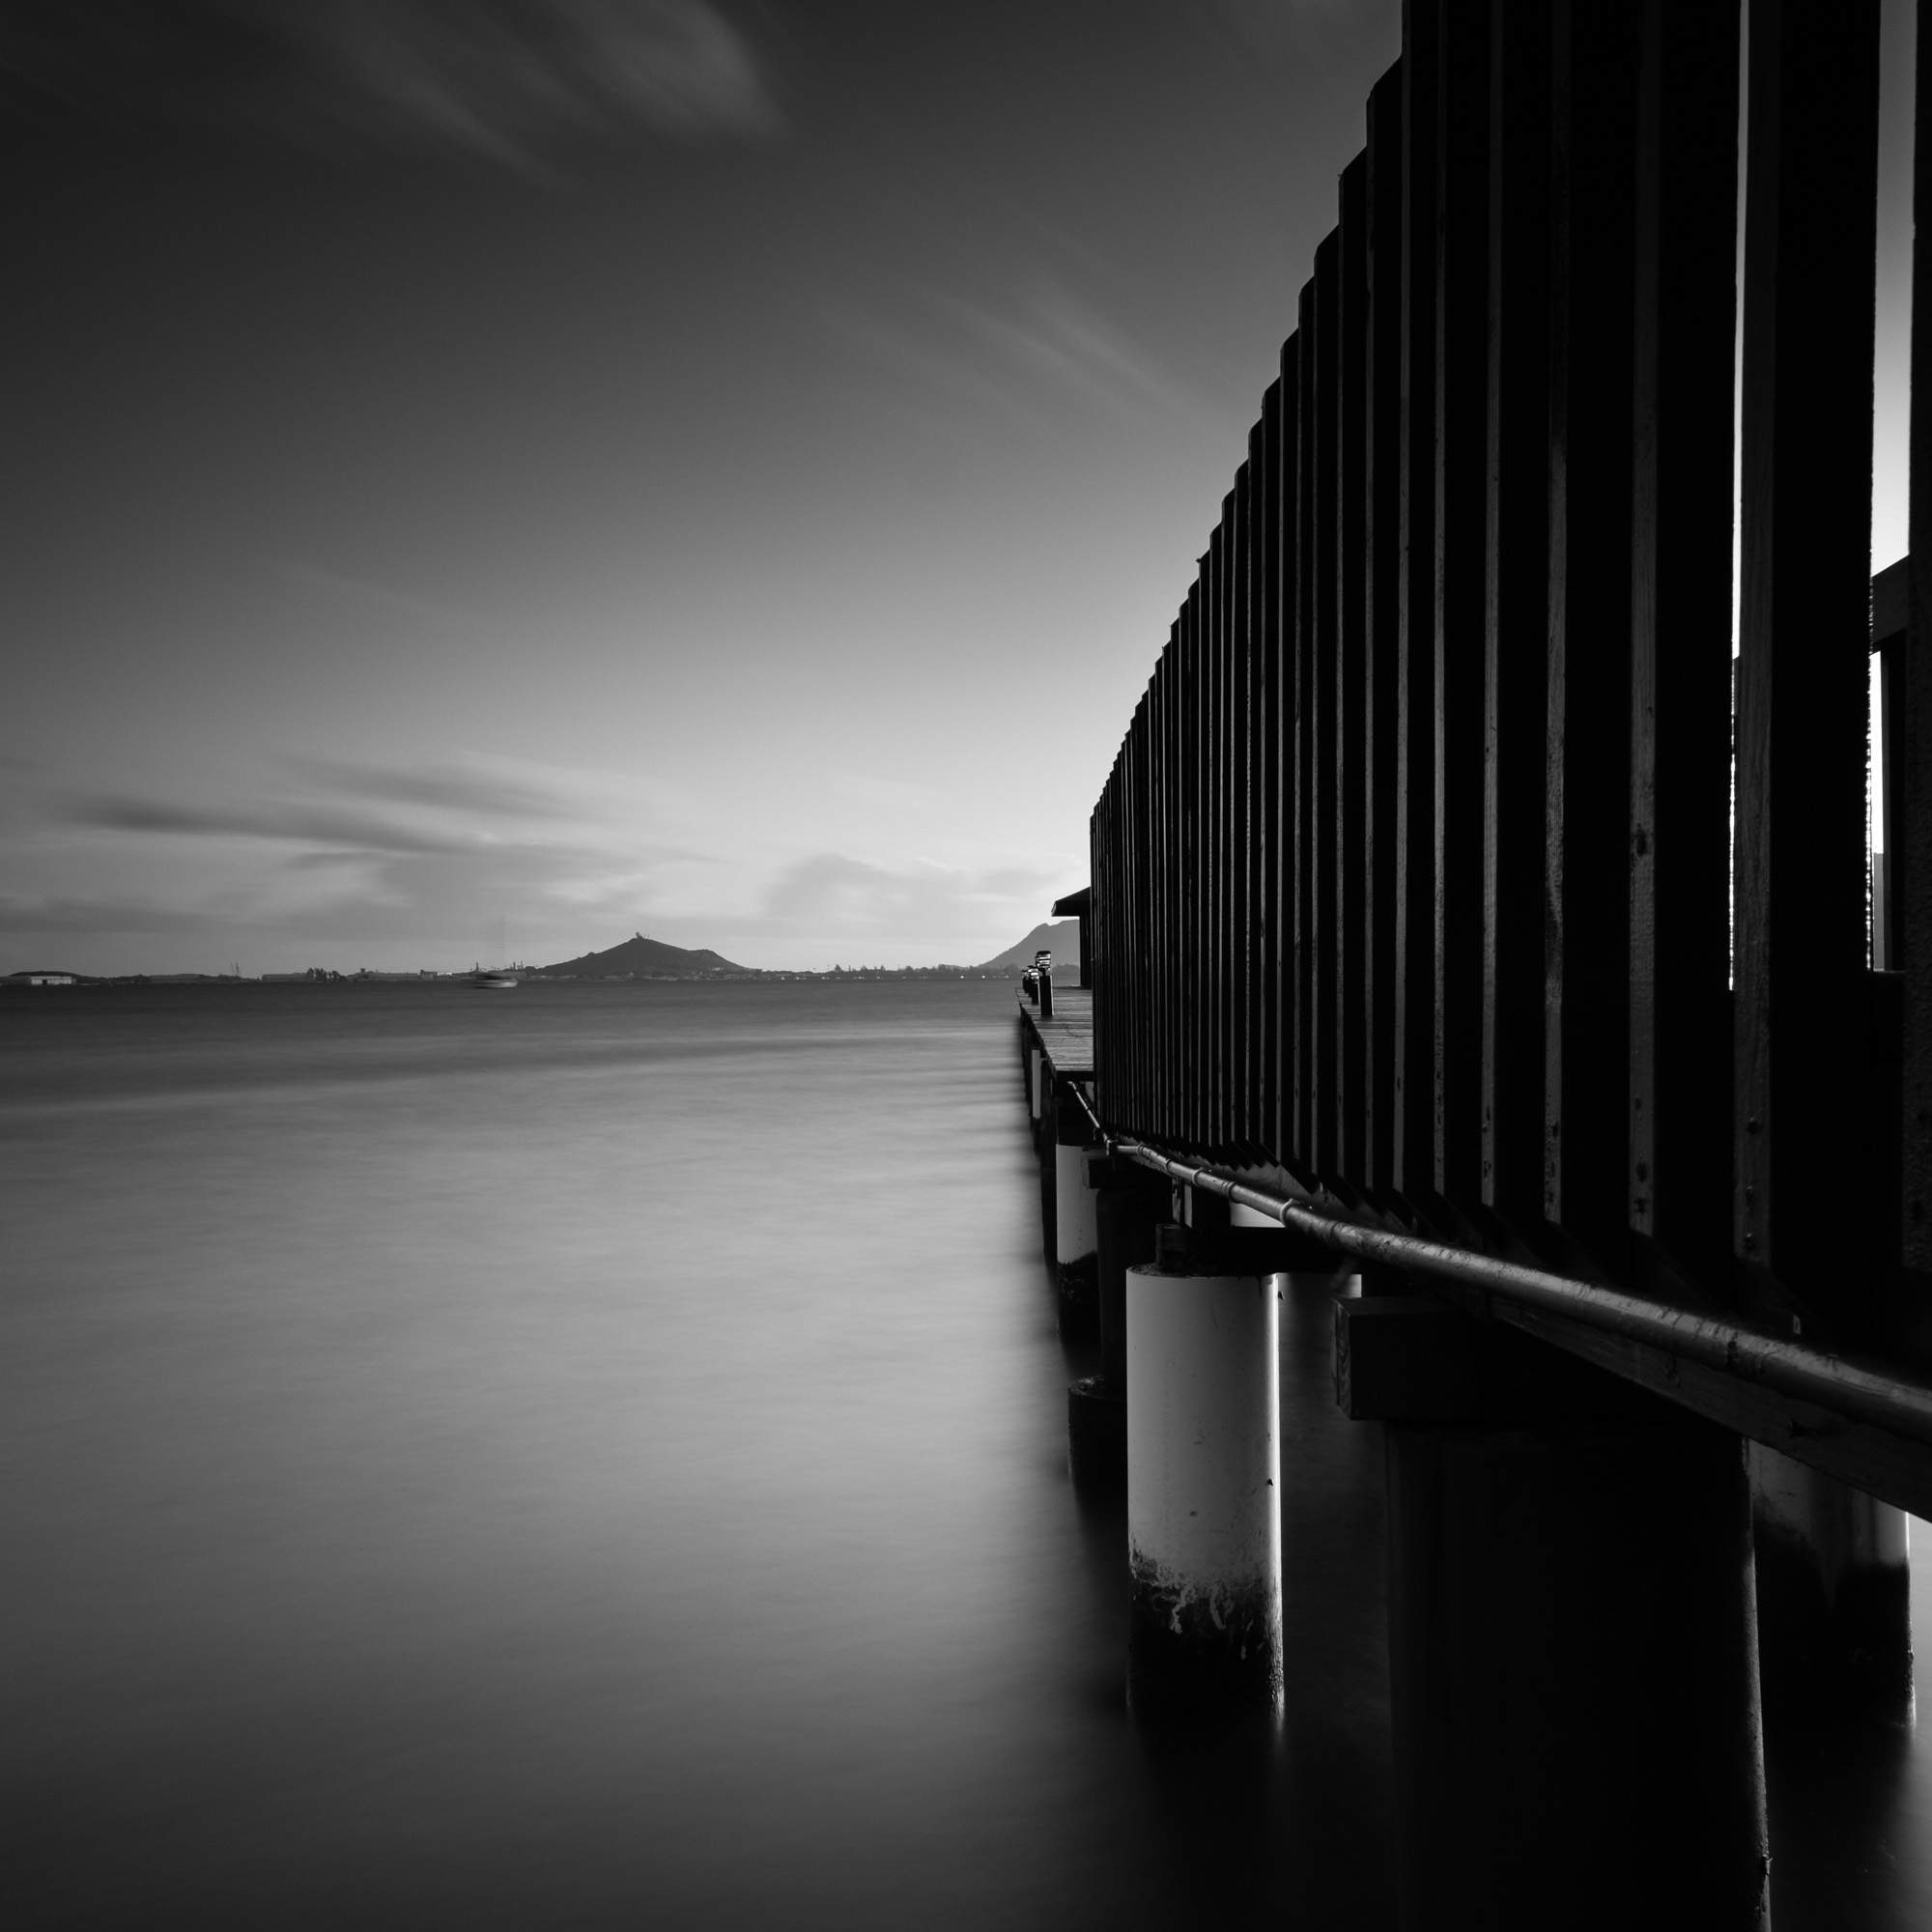 Kaneohe Beach Park Lee Filter Big Stopper & 3 stop medium grad Fujifilm XPRO2  |  60 sec. |  f/11 |  ISO 50  |  Fujifilm XF 16mm F/1.4 R WR  Edited in Lightroom CC 2015  Copyright 2016 Ryan Sakamoto, All rights reserved